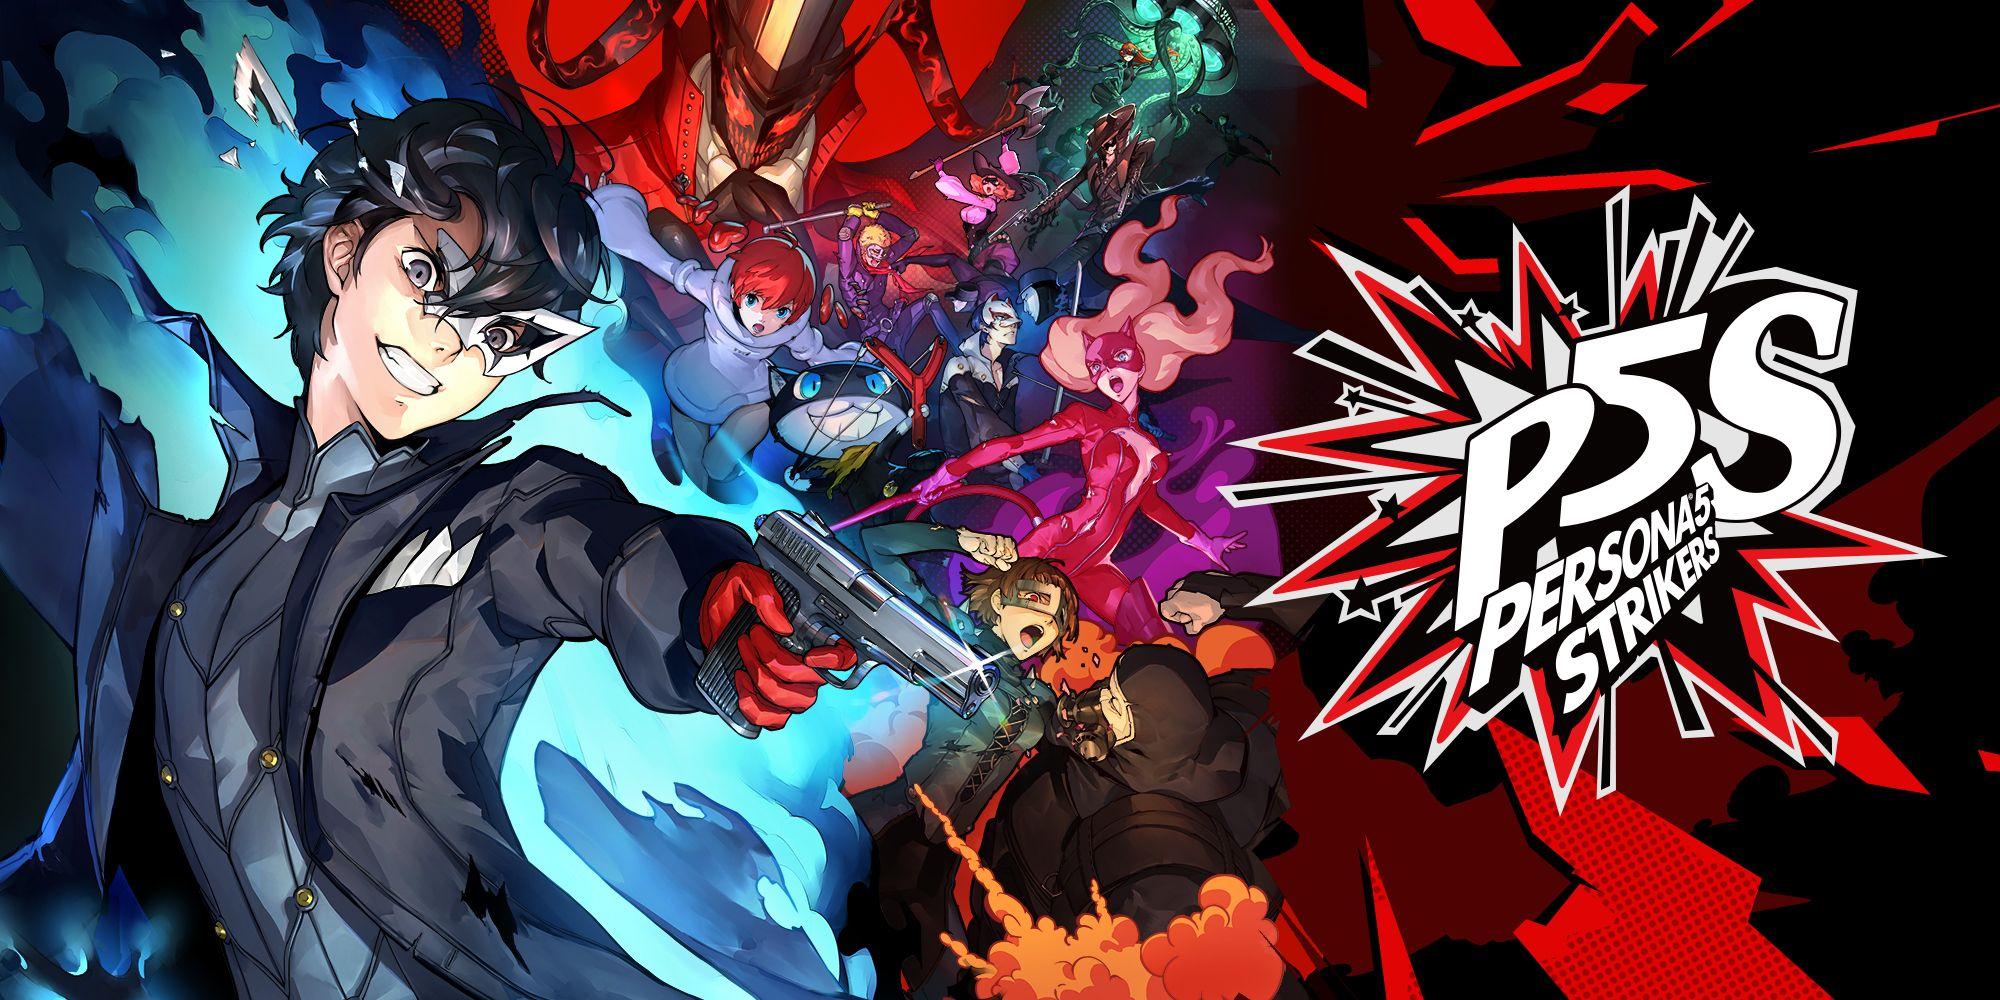 Persona_5_Strikers_ban.jpg